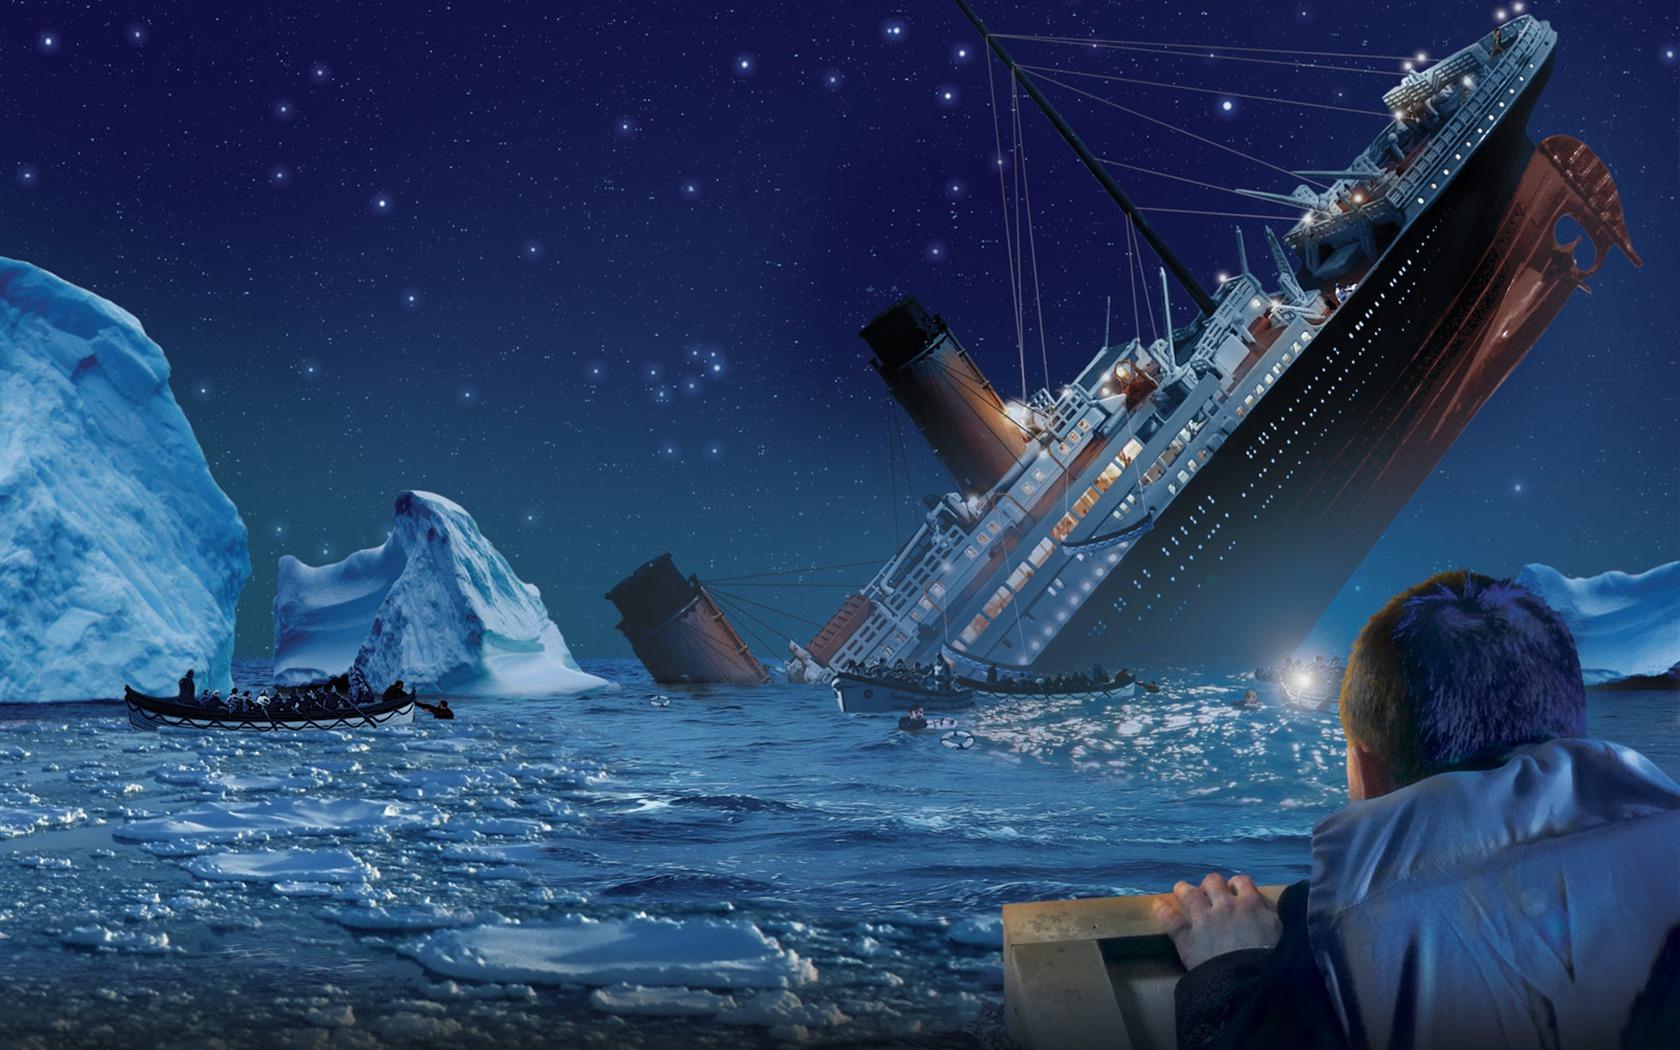 Титаник обои 3d | 3Д картинки и ...: kras3d.ru/titanik-oboi-3d